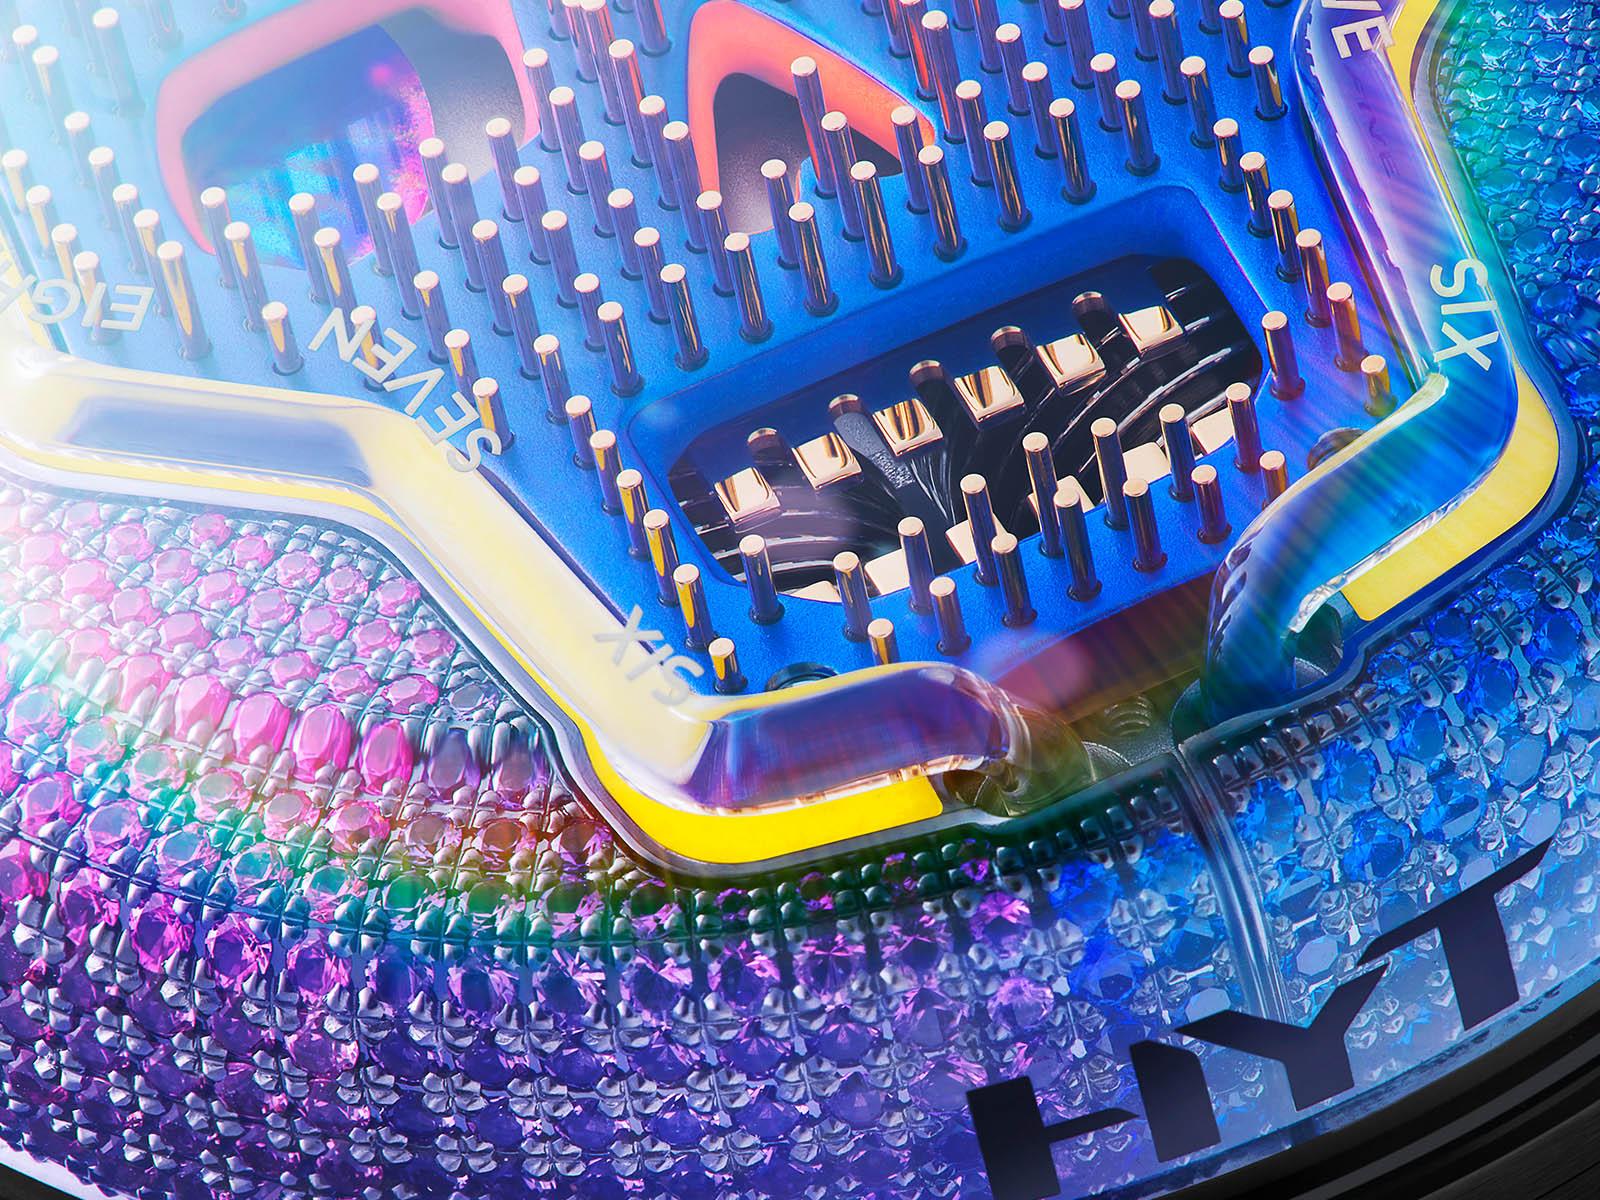 h02513-hyt-soonow-instant-rainbow-6.jpg